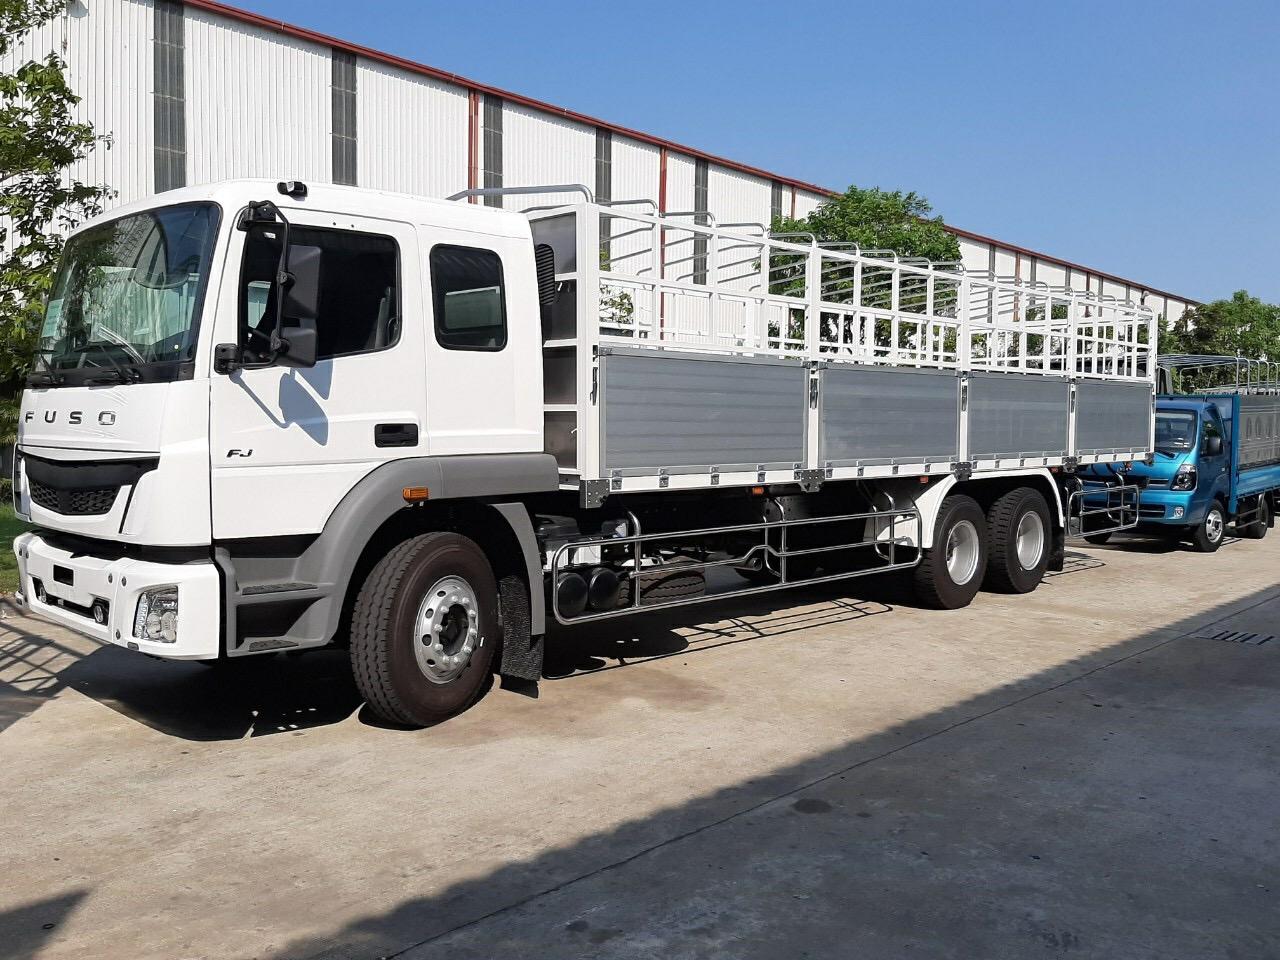 Giới thiệu xe tải Fuso FJ 285 3 chân.